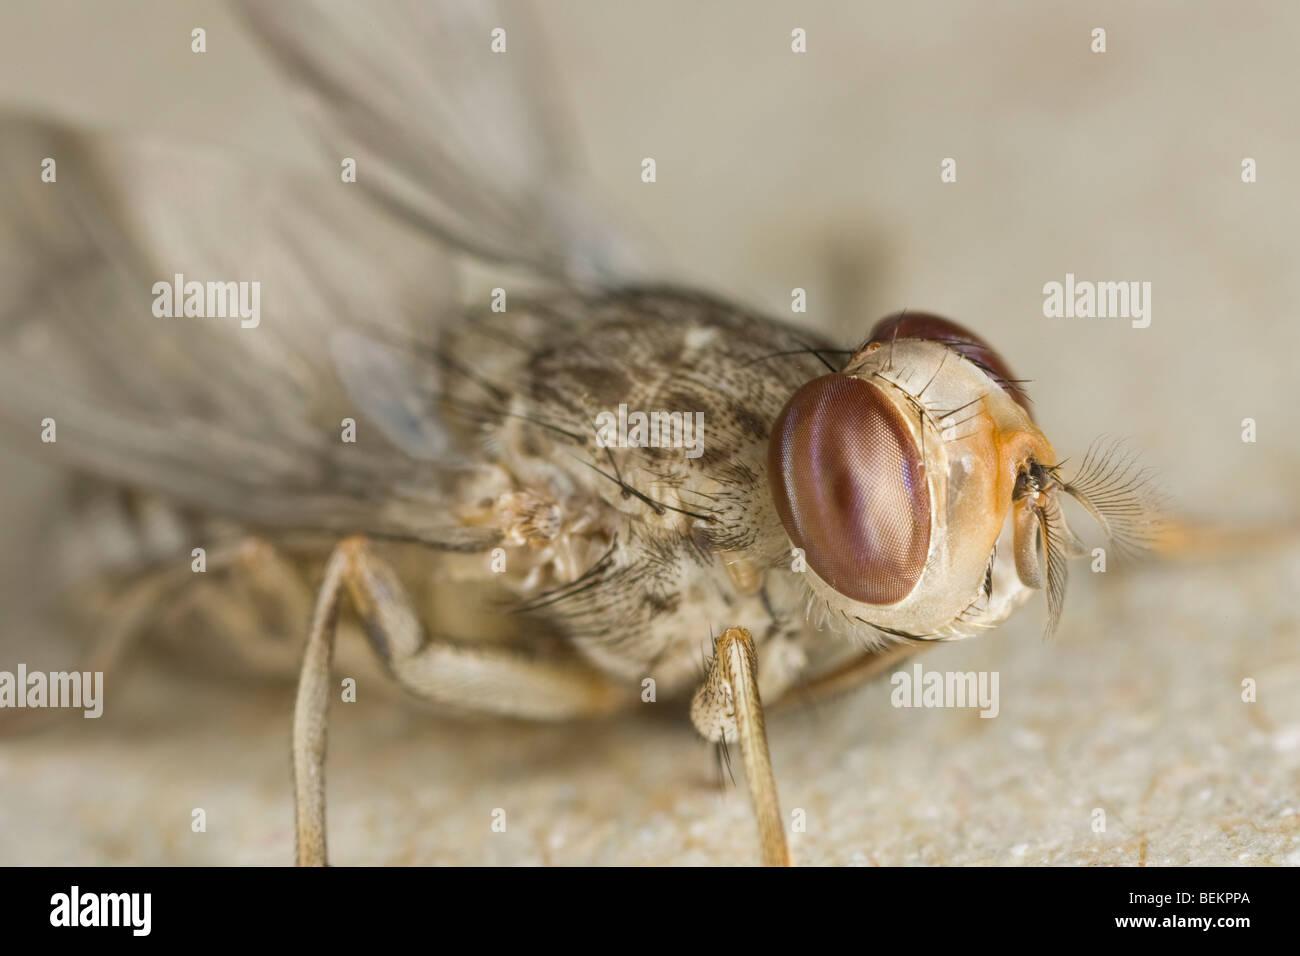 Nouveau eclosed Savannah mâle mouche tsé-tsé (Glossina morsitans morsitans) Photo Stock